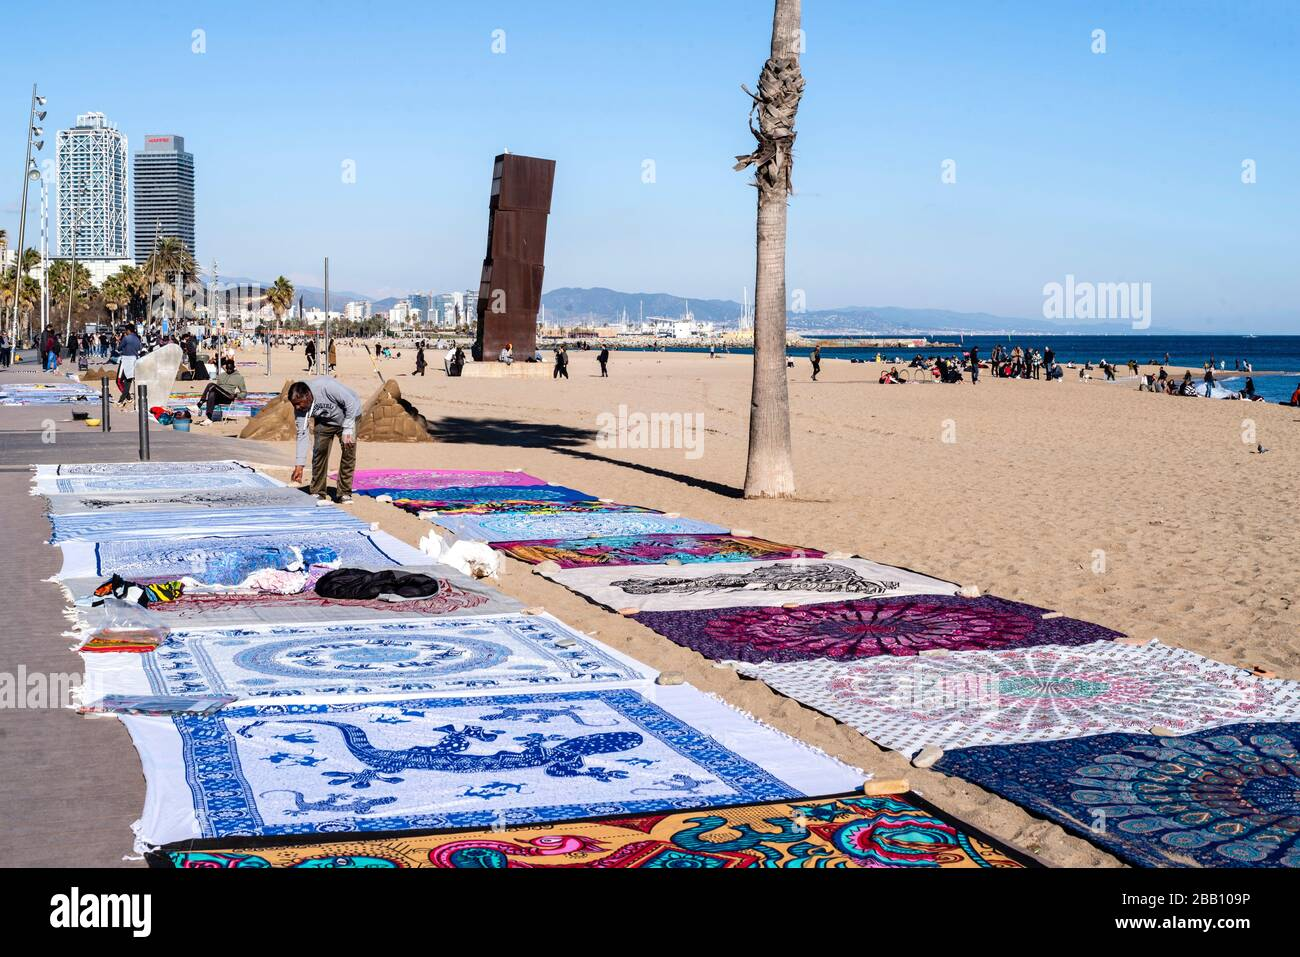 Barceloneta beache, Barcelona, Catalonia, Spain. Stock Photo